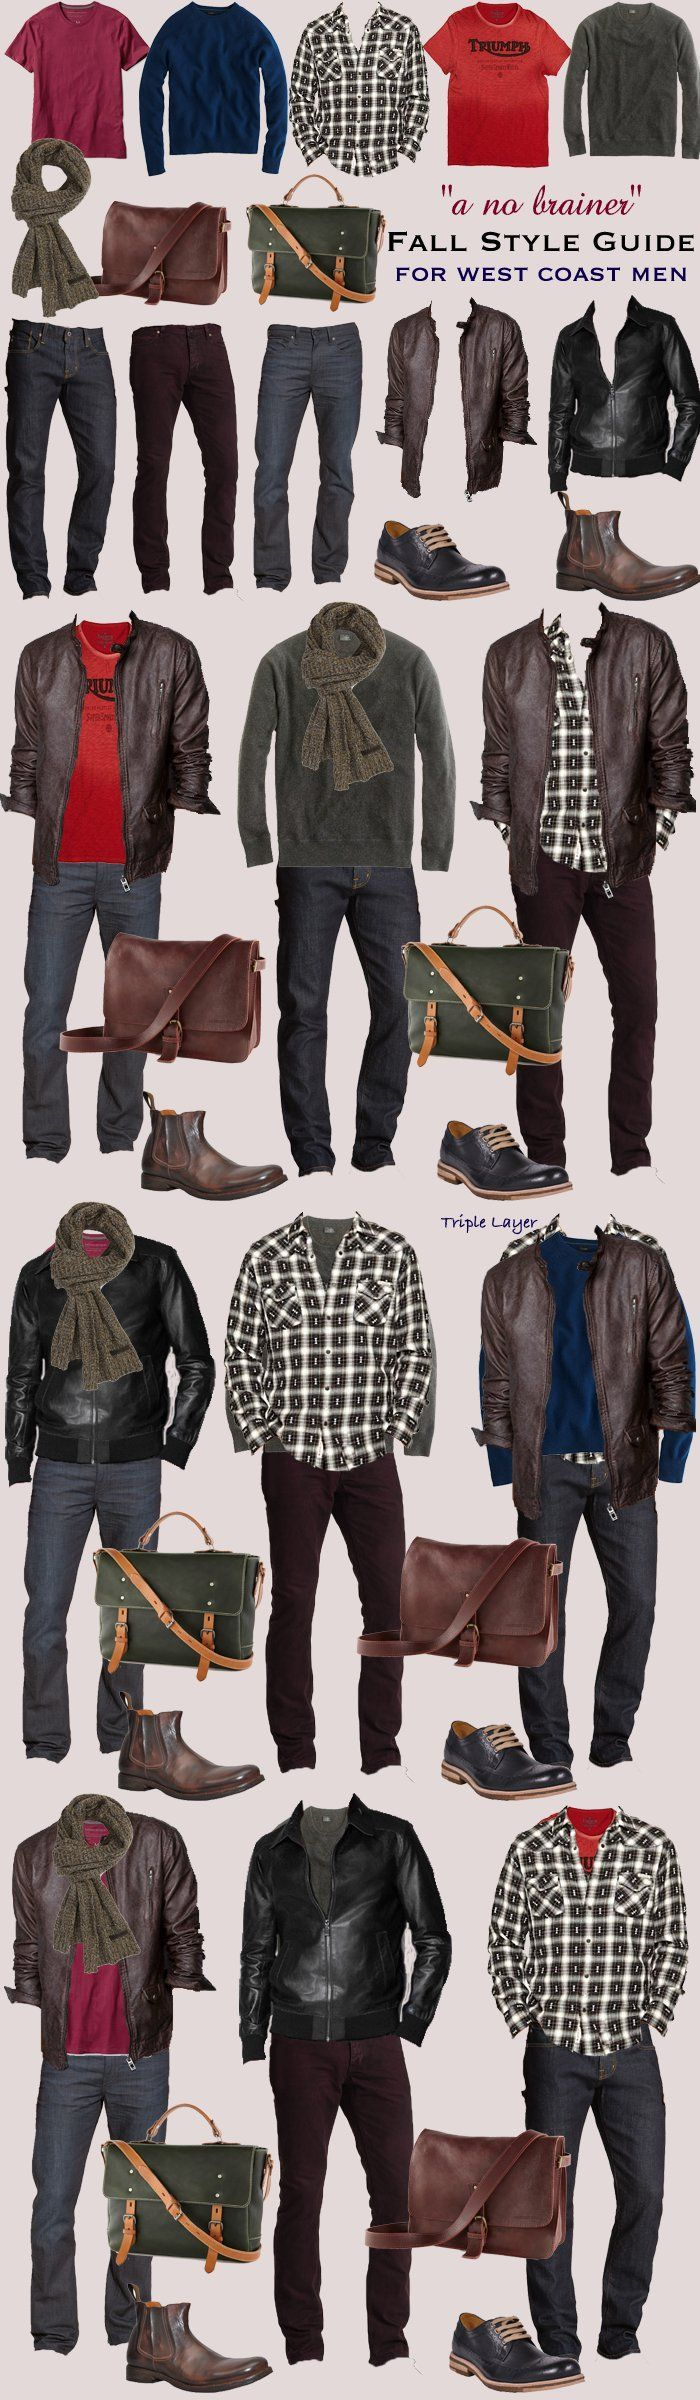 (21) Pin by GentlemansEssentials on Gentlemans's Apparel   Pinterest